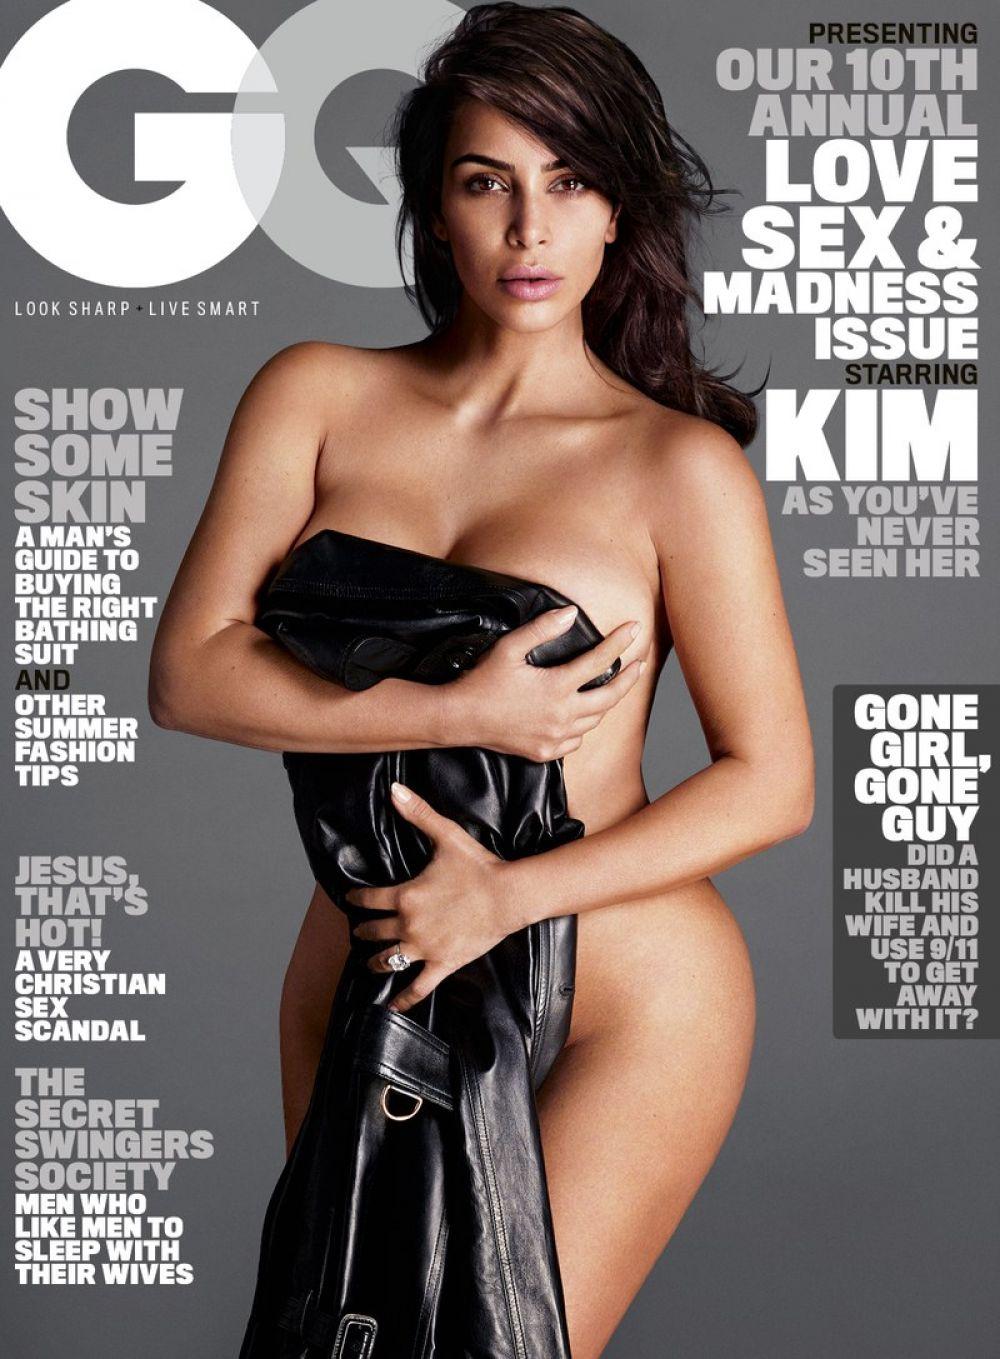 KIM KARDASHIAN in GQ Magazine, June 2016 Issue